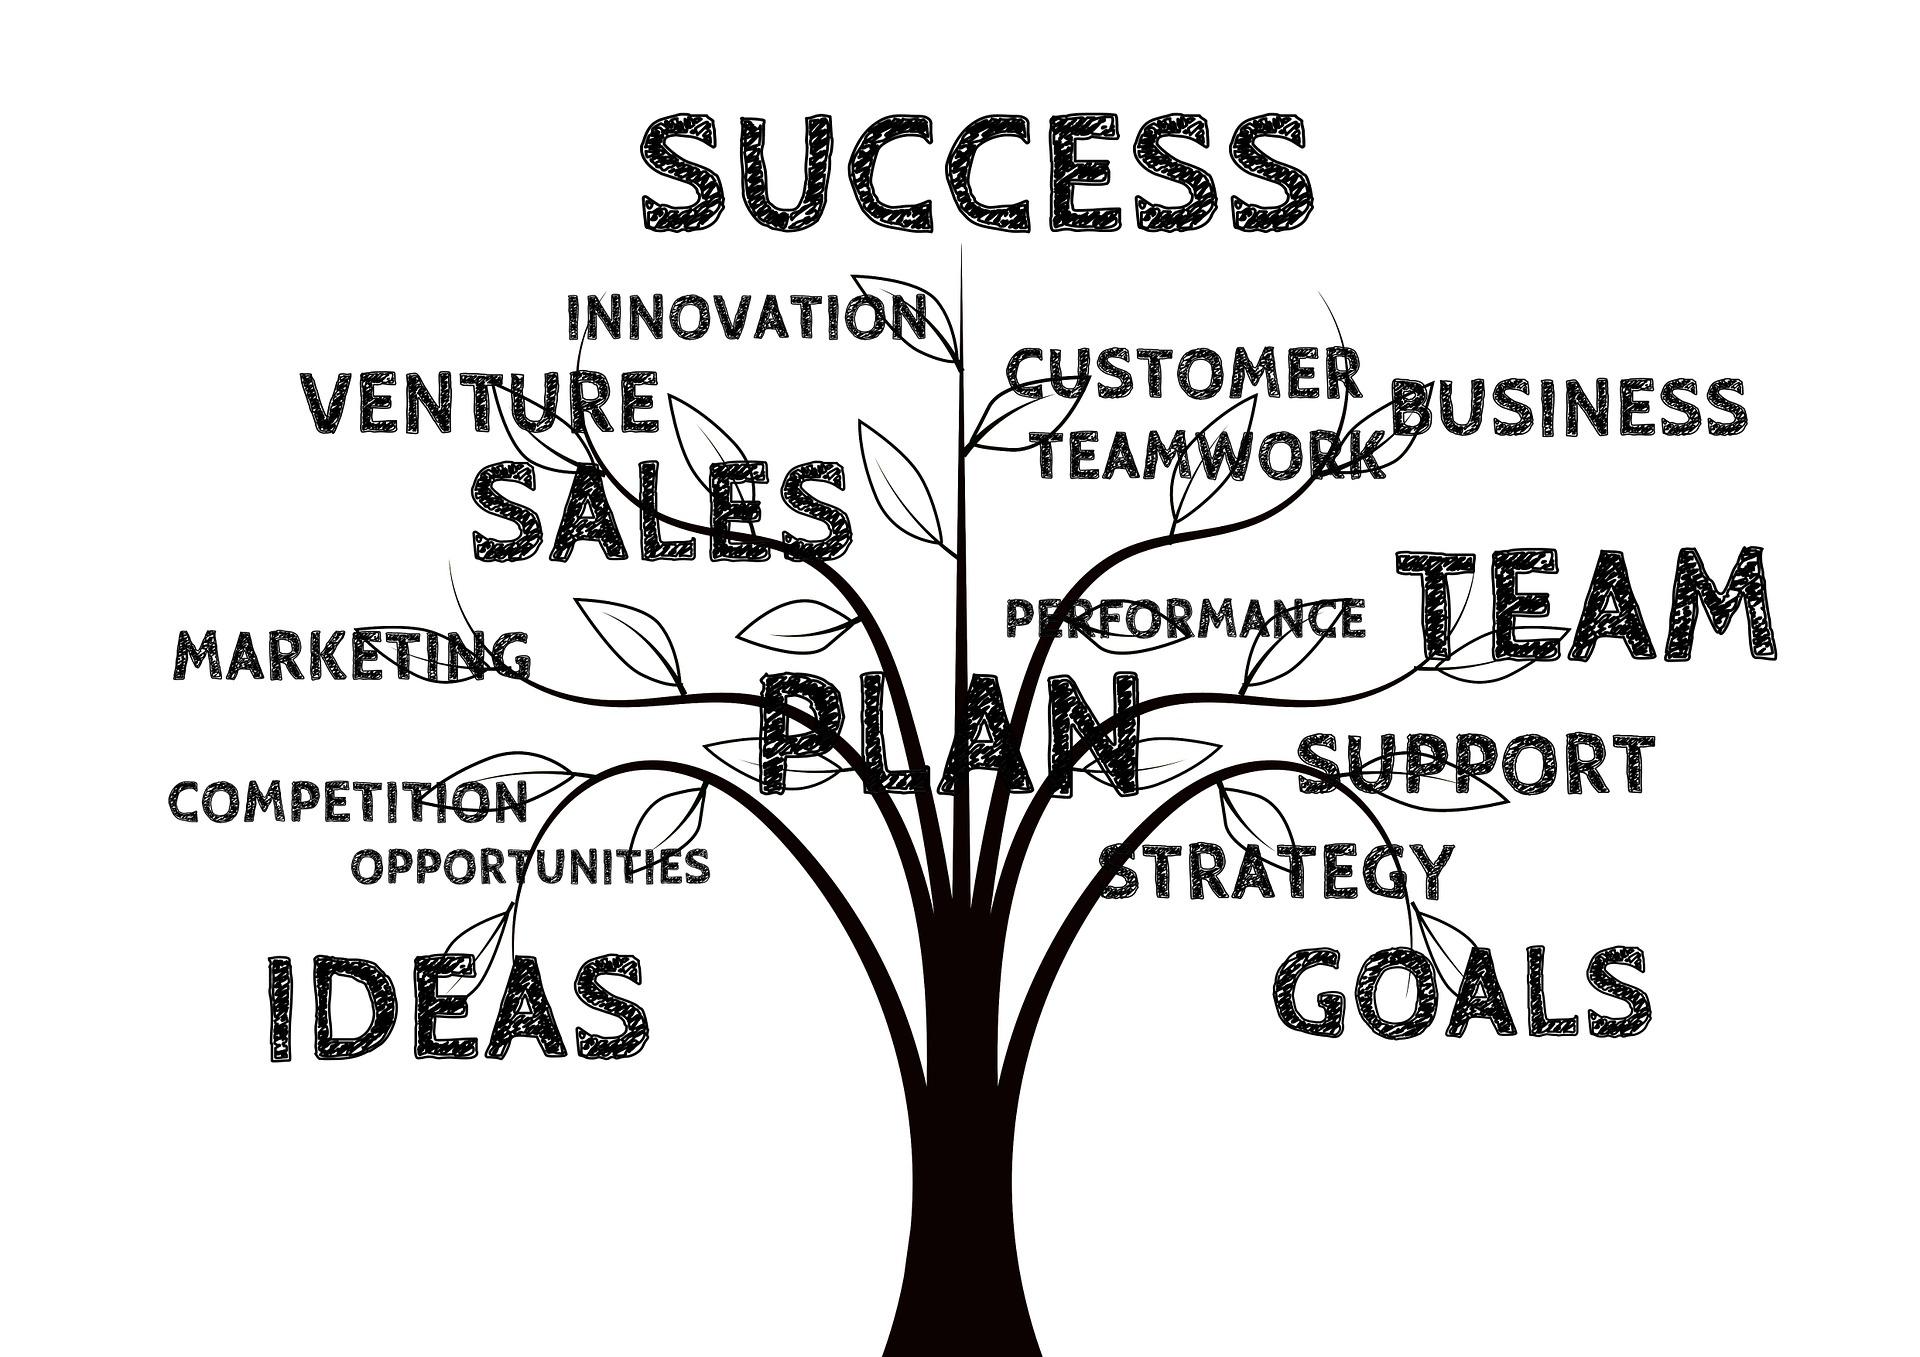 Traditional Marketing and Digital Marketing, Traditional Marketing Vs Digital Marketing, Social Media Marketing, Online Marketing